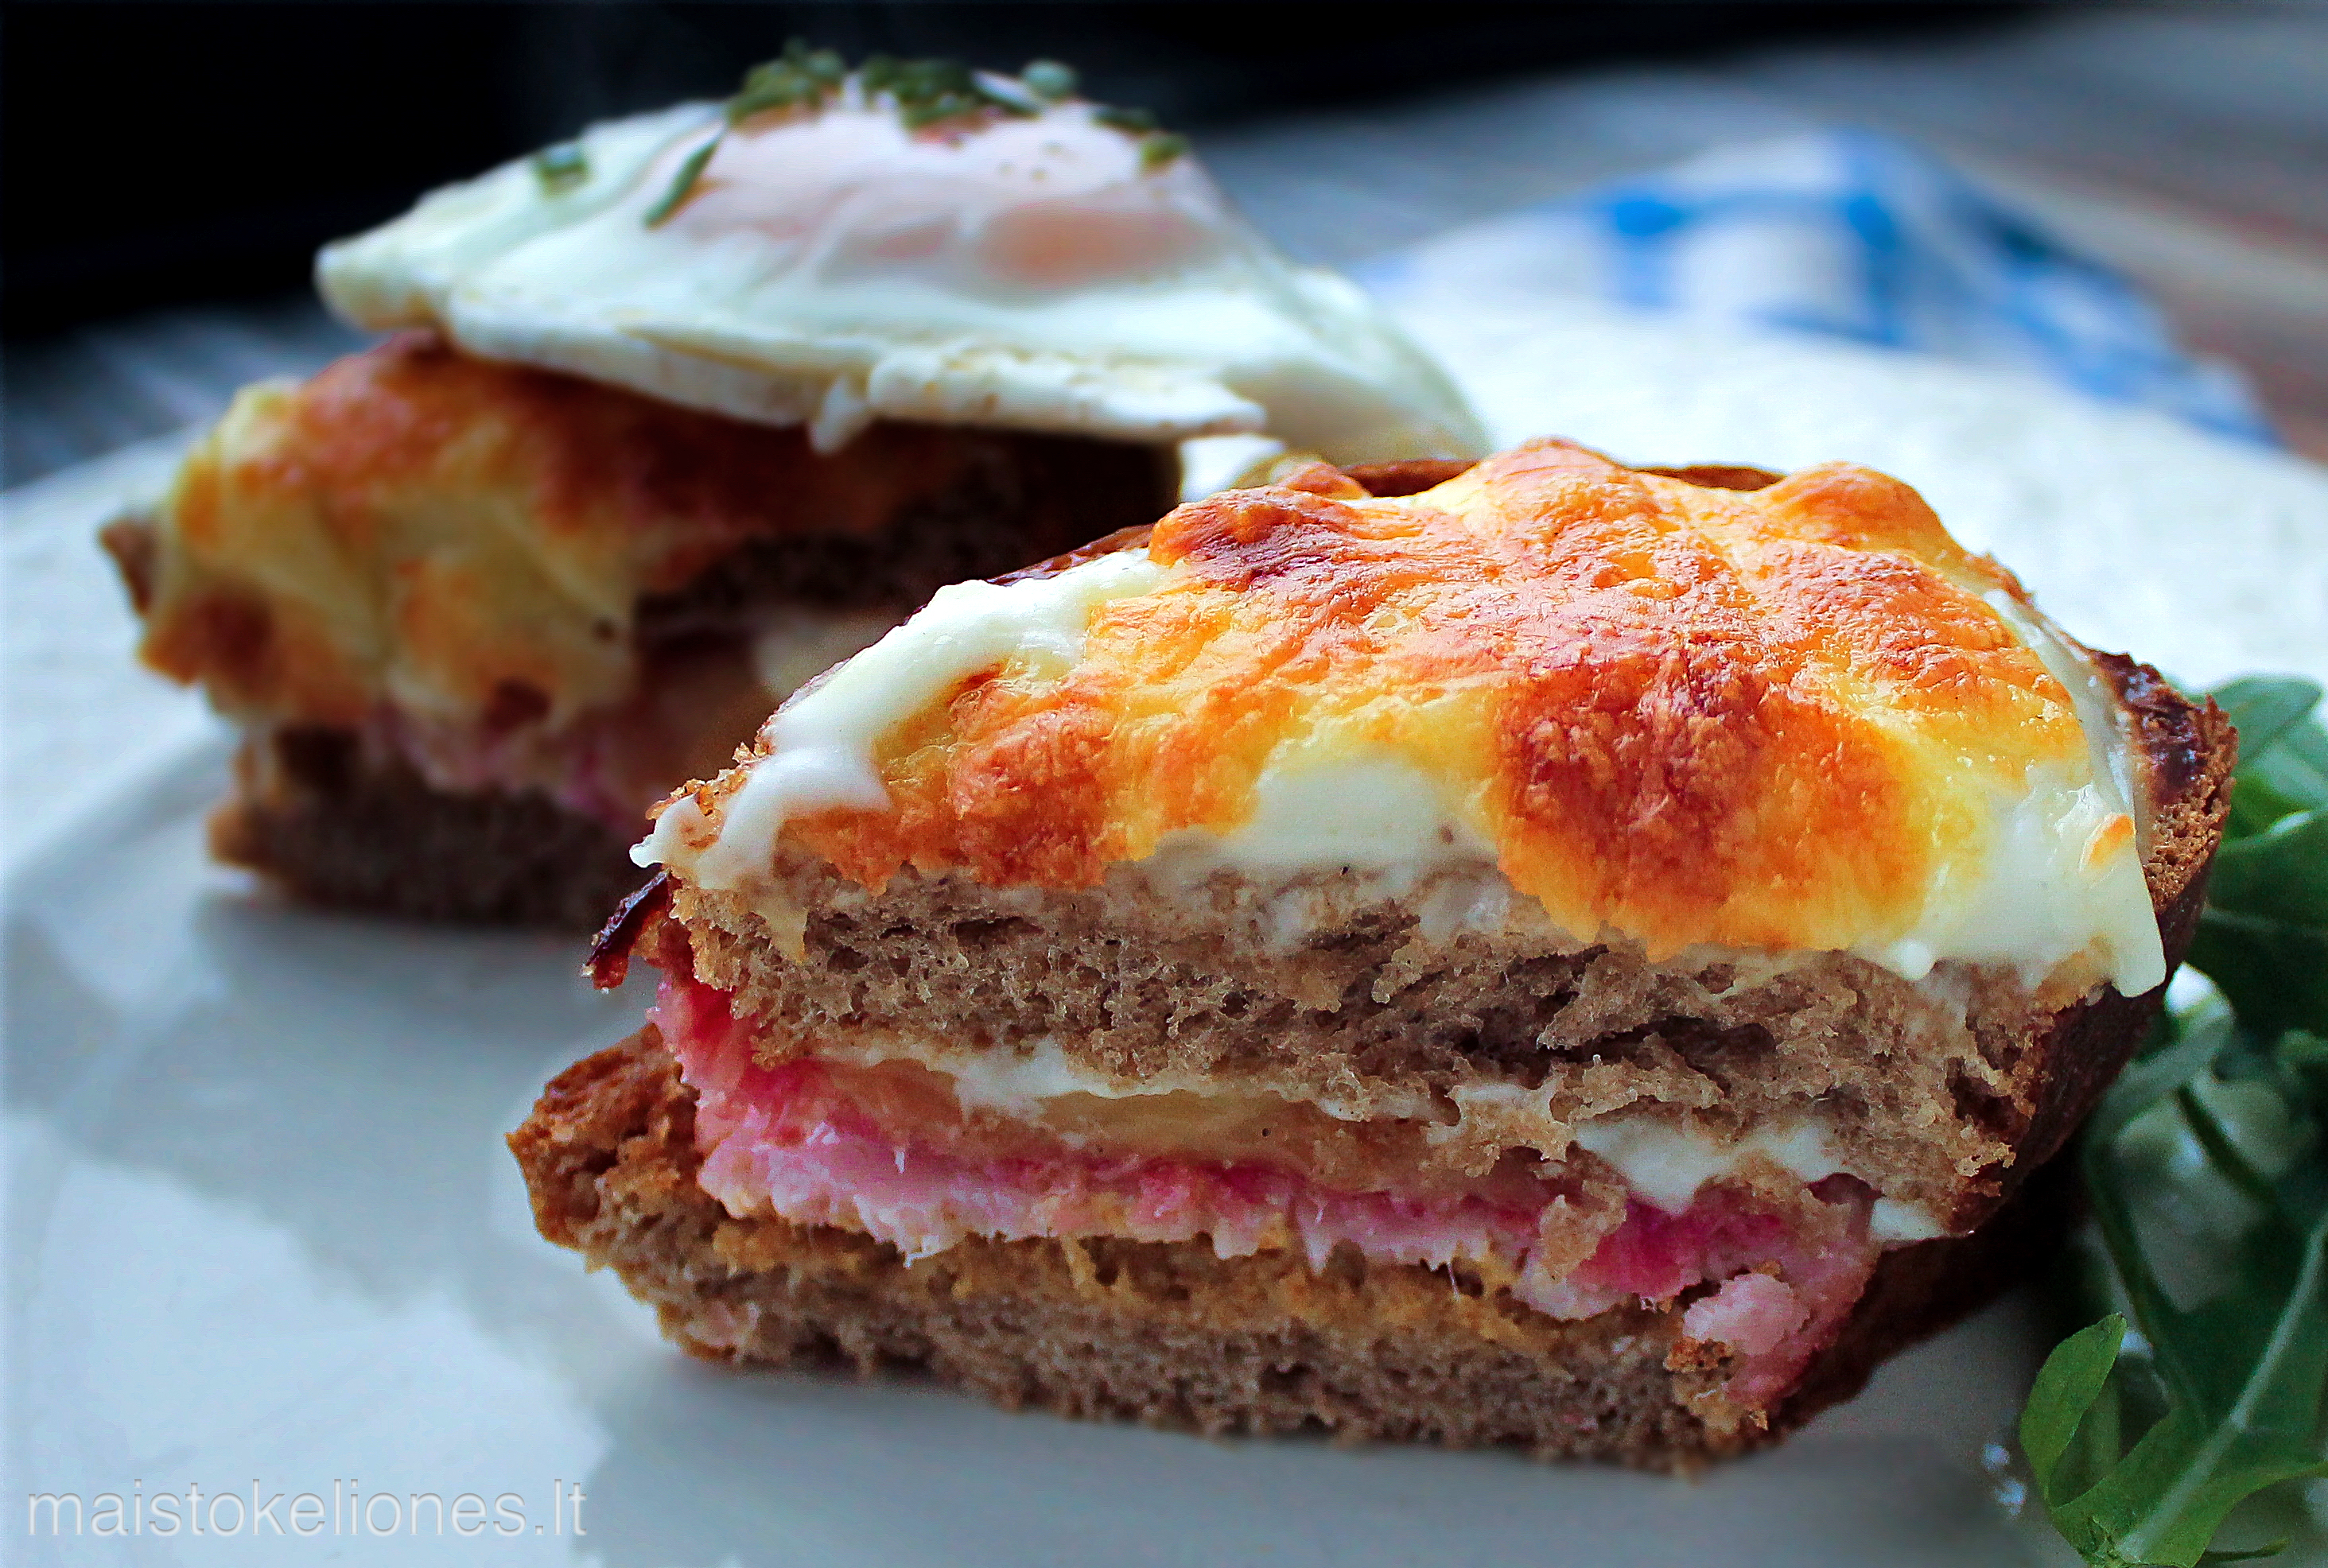 Croque monsieur sumuštinis